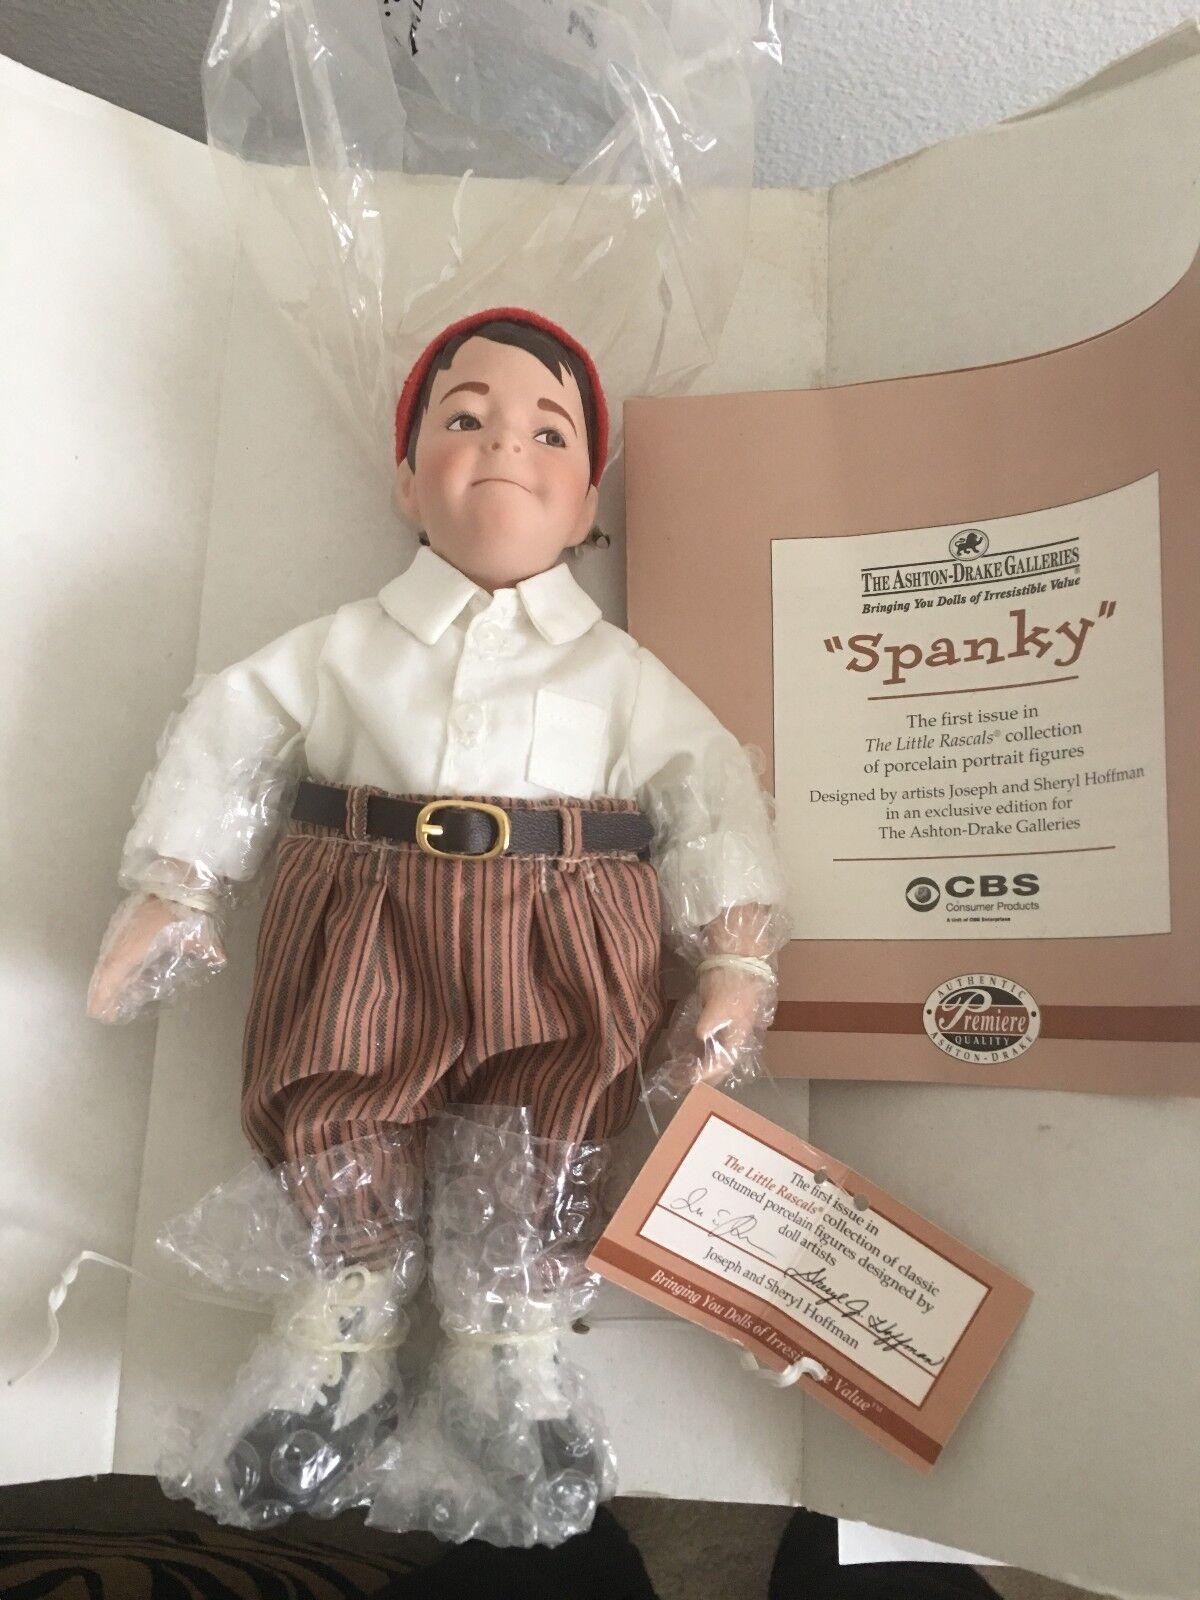 Figura De Porcelana Spanky la pequeña granujas Ashton Drake Galleries